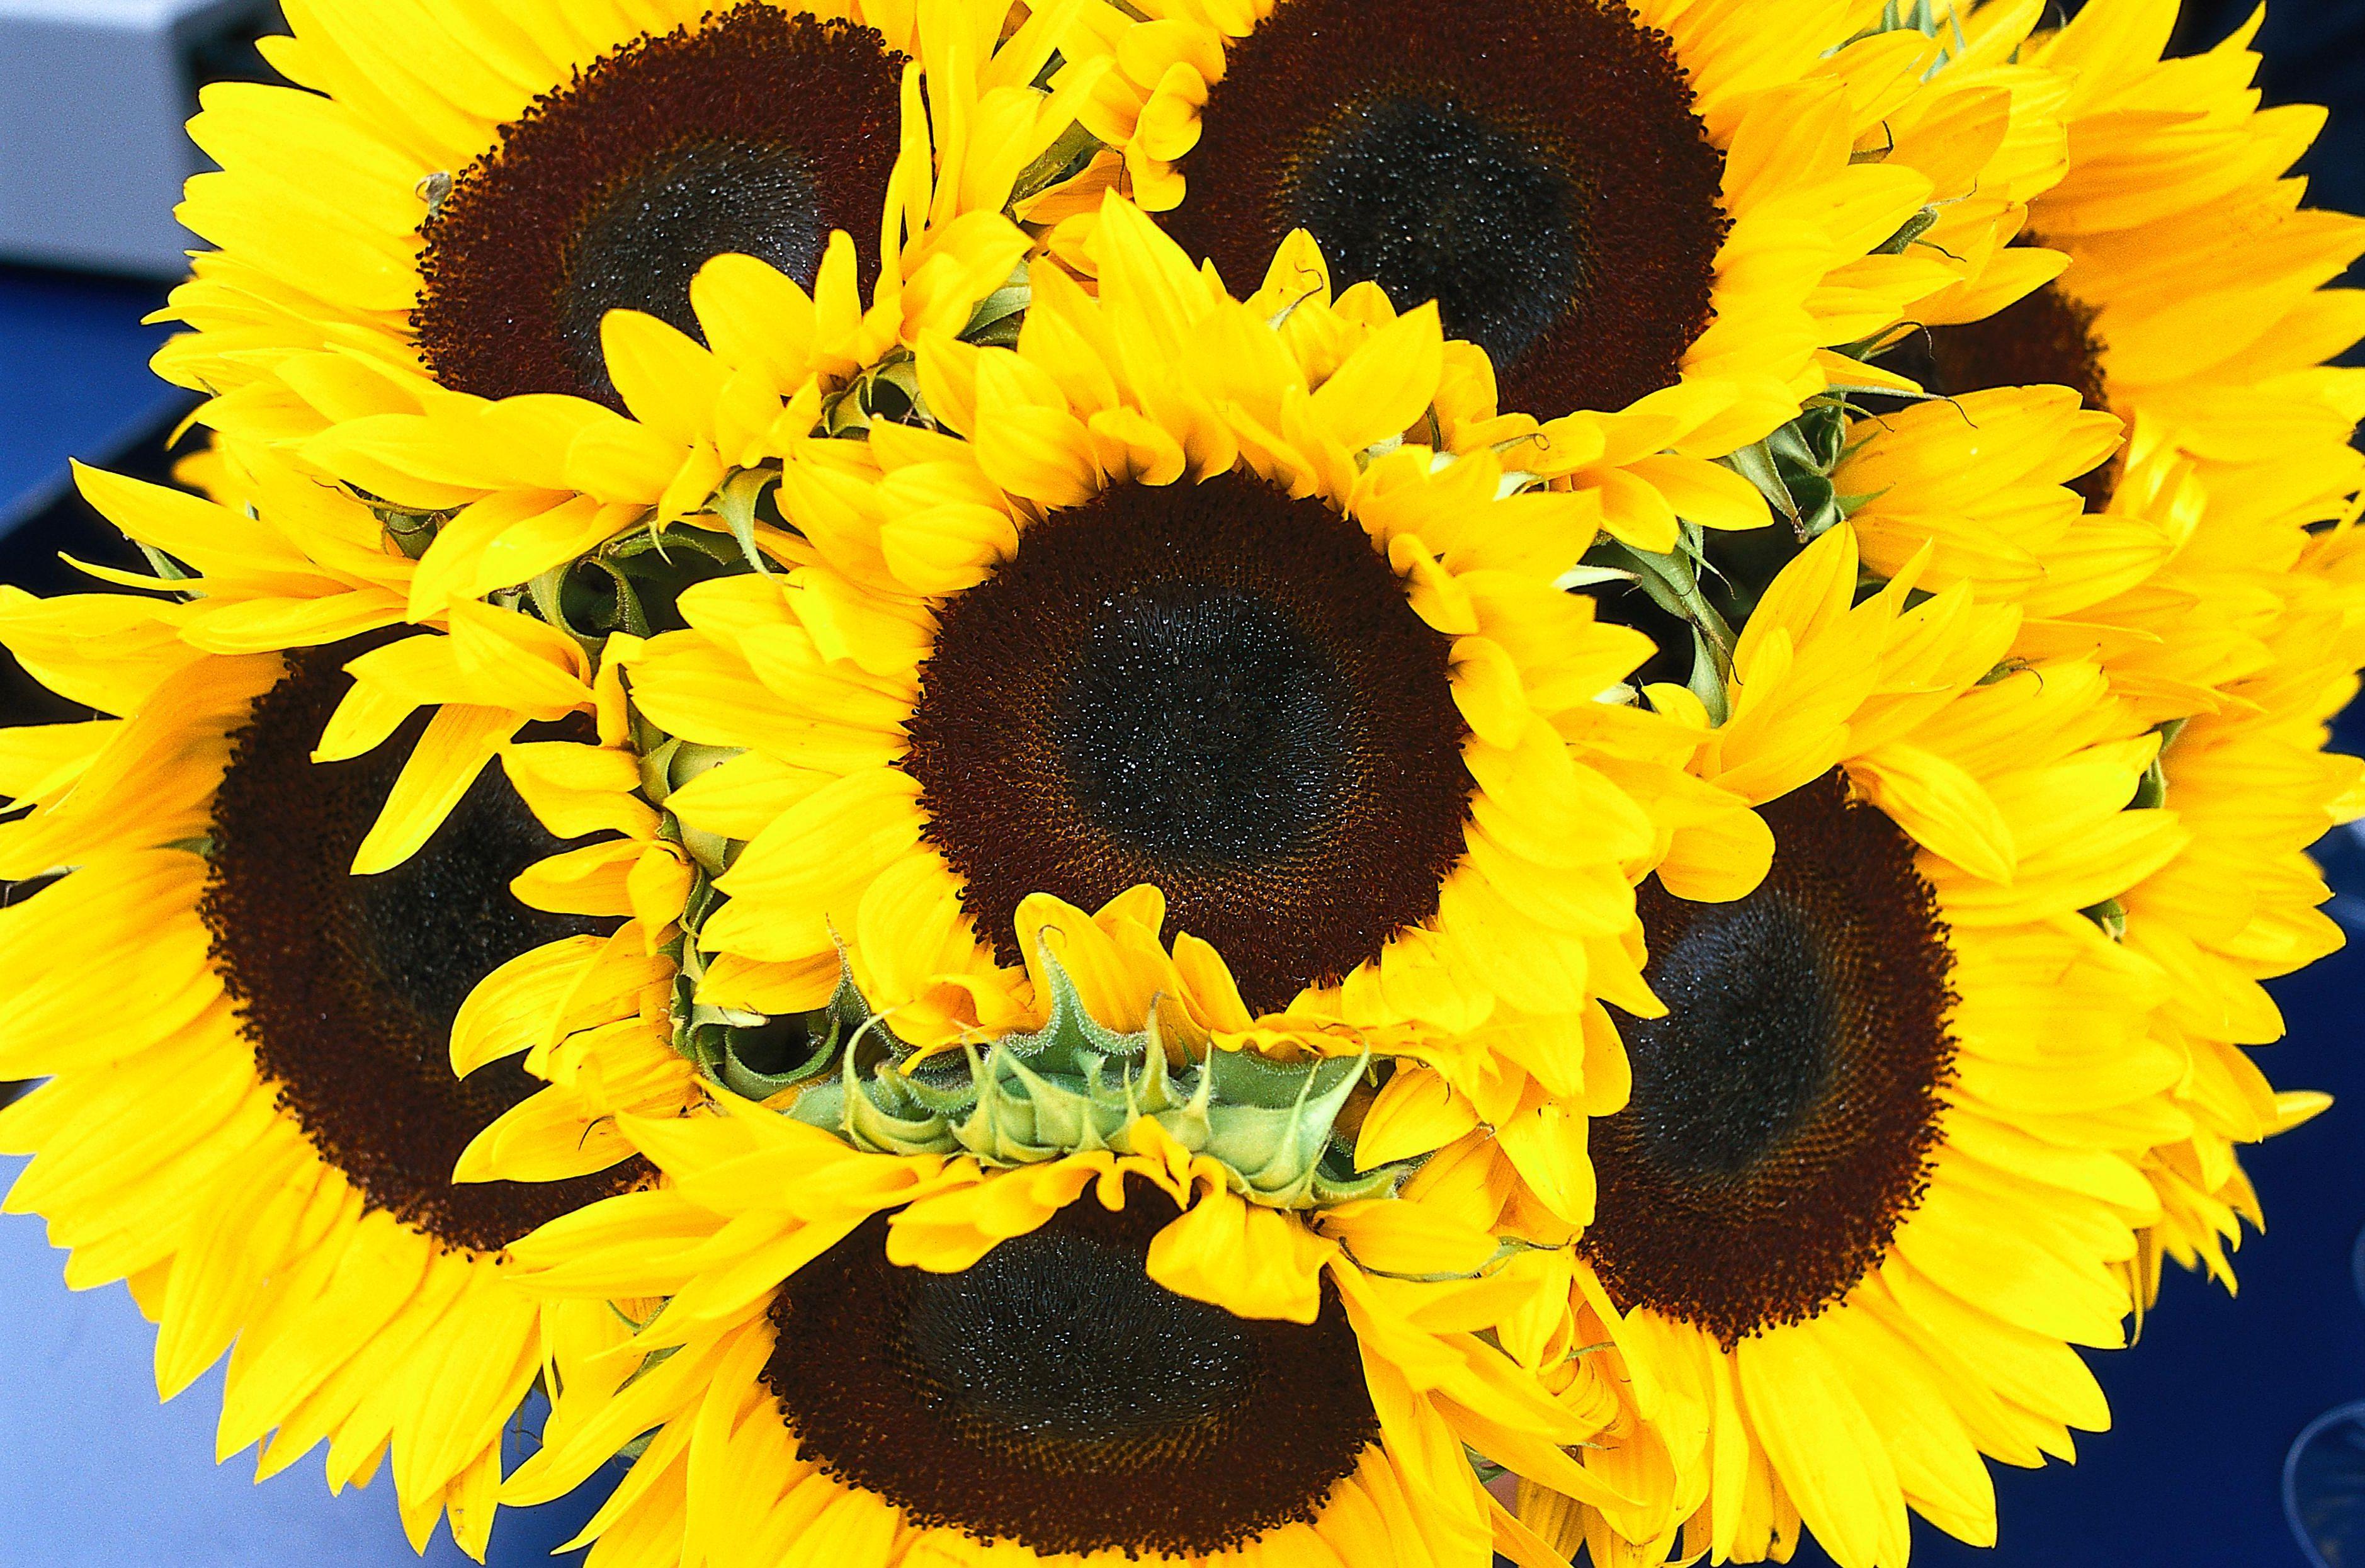 Sunbright Sunflowers